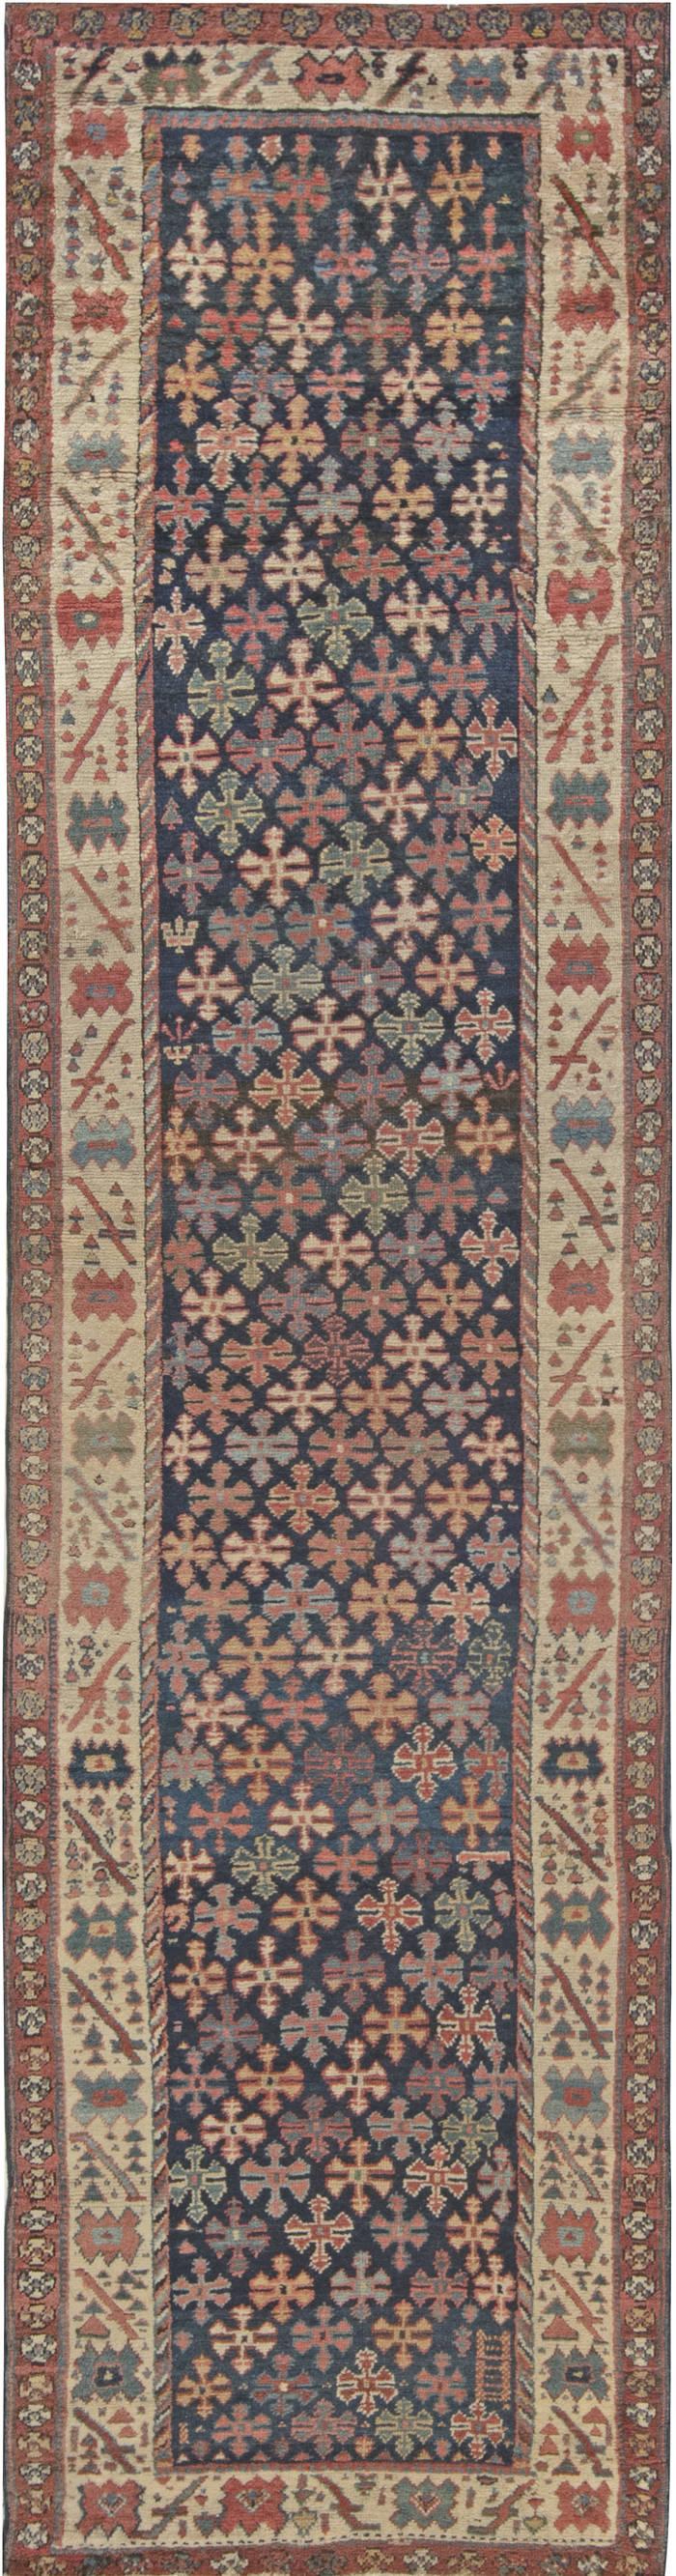 Antique Persian Malayer Runner BB7007